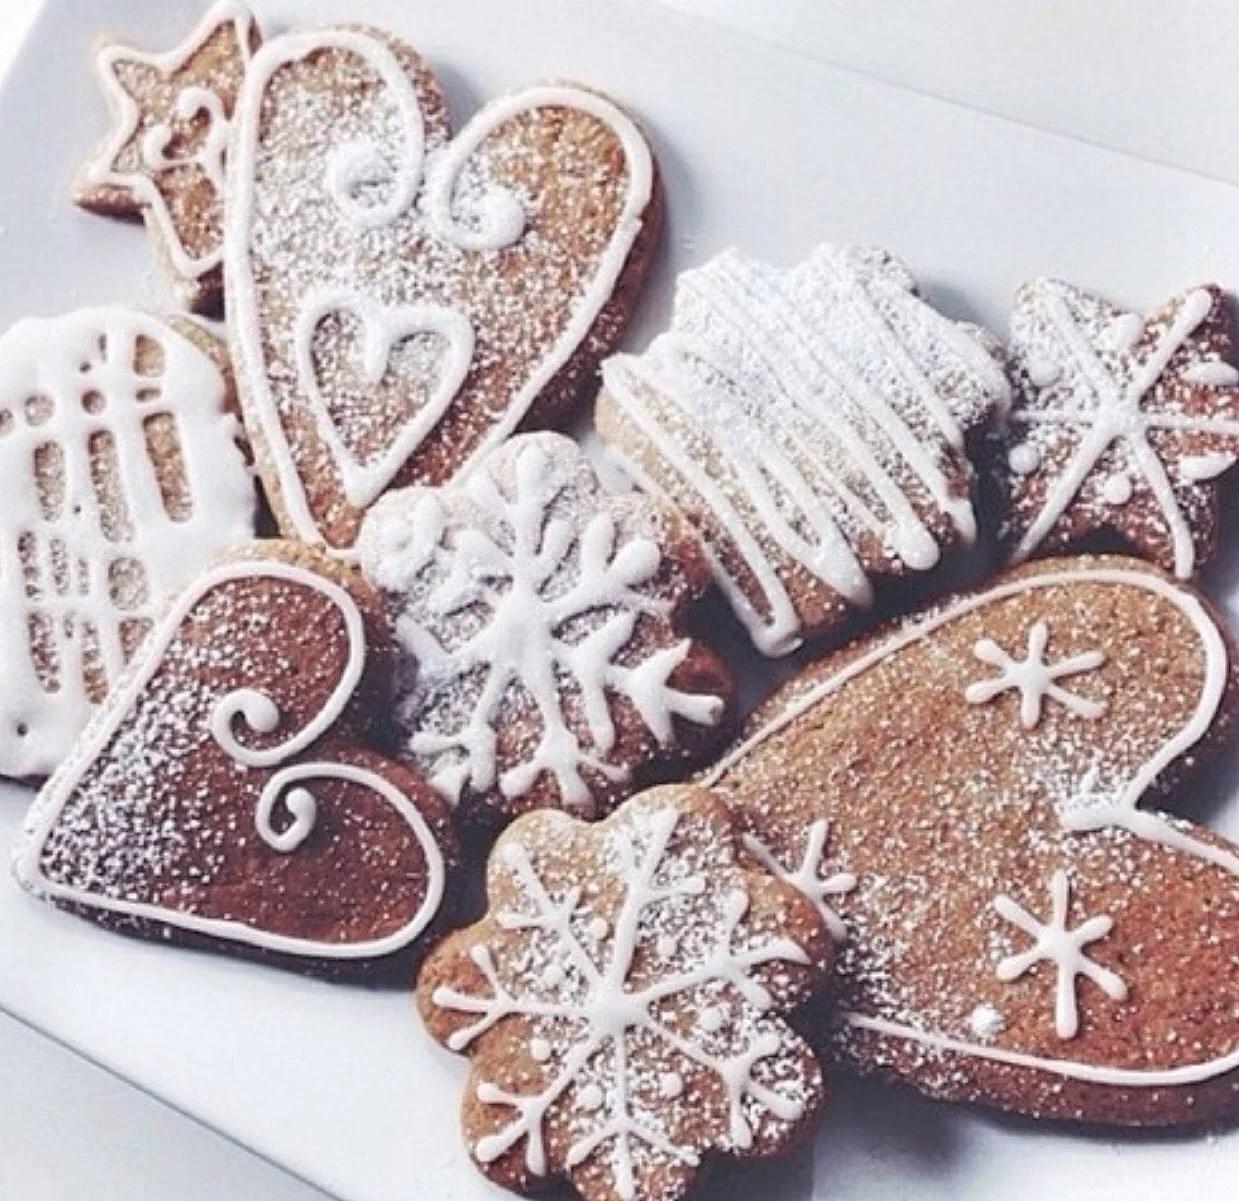 ❄️ Jul inspiration ❄️